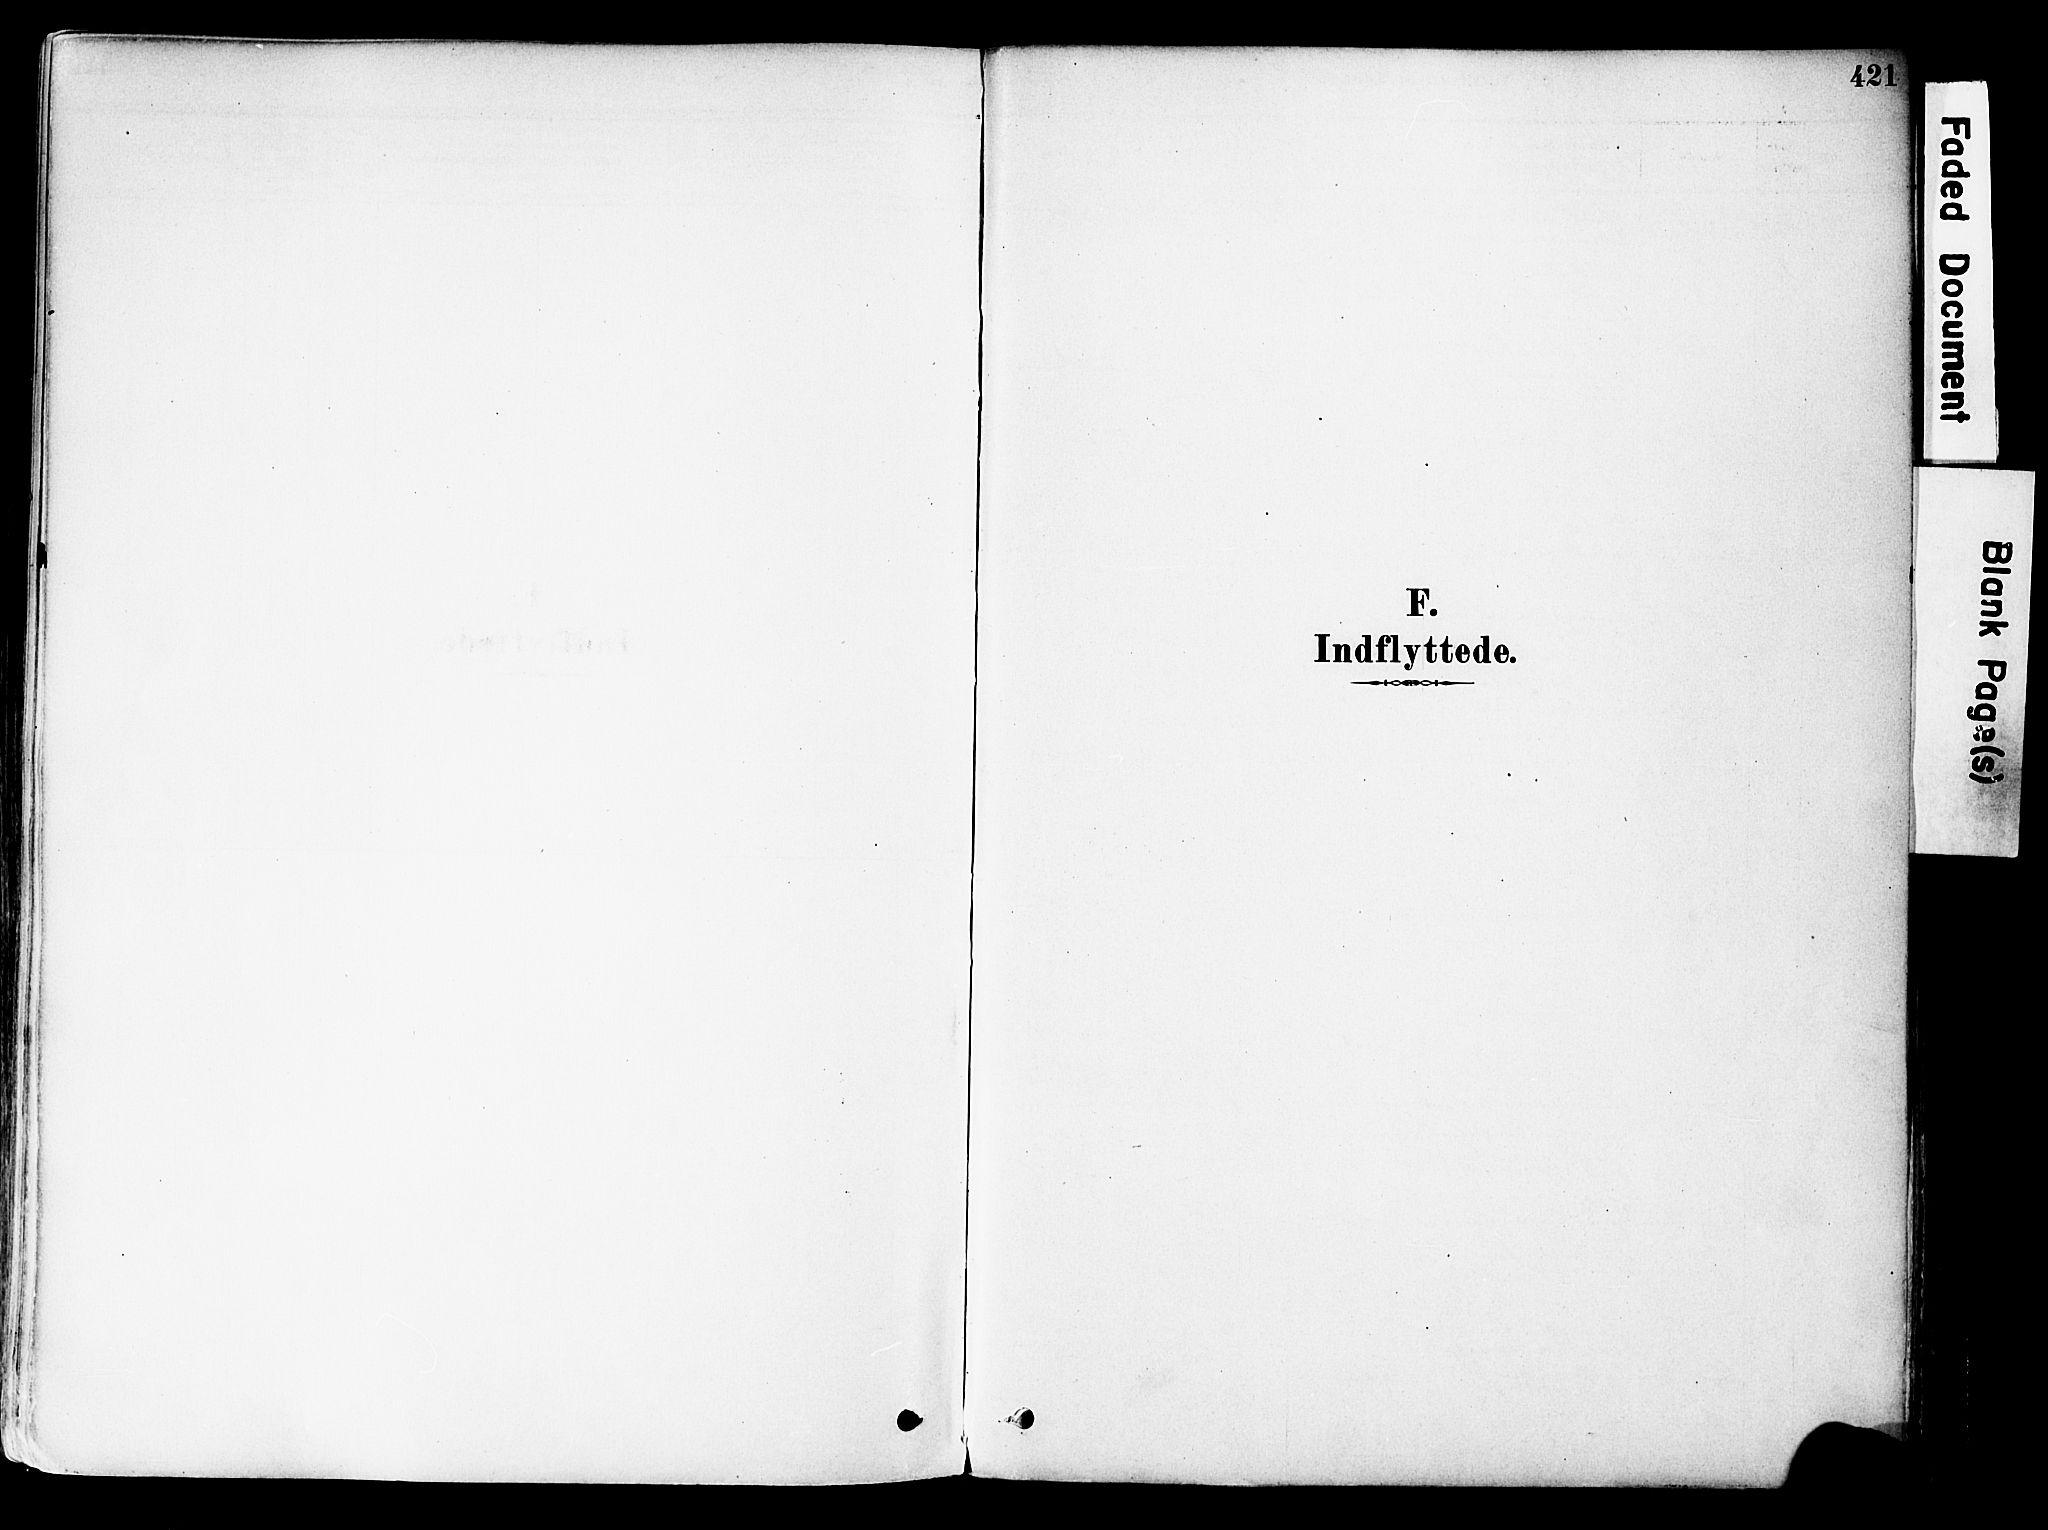 SAH, Østre Toten prestekontor, Ministerialbok nr. 6 /1, 1878-1896, s. 421